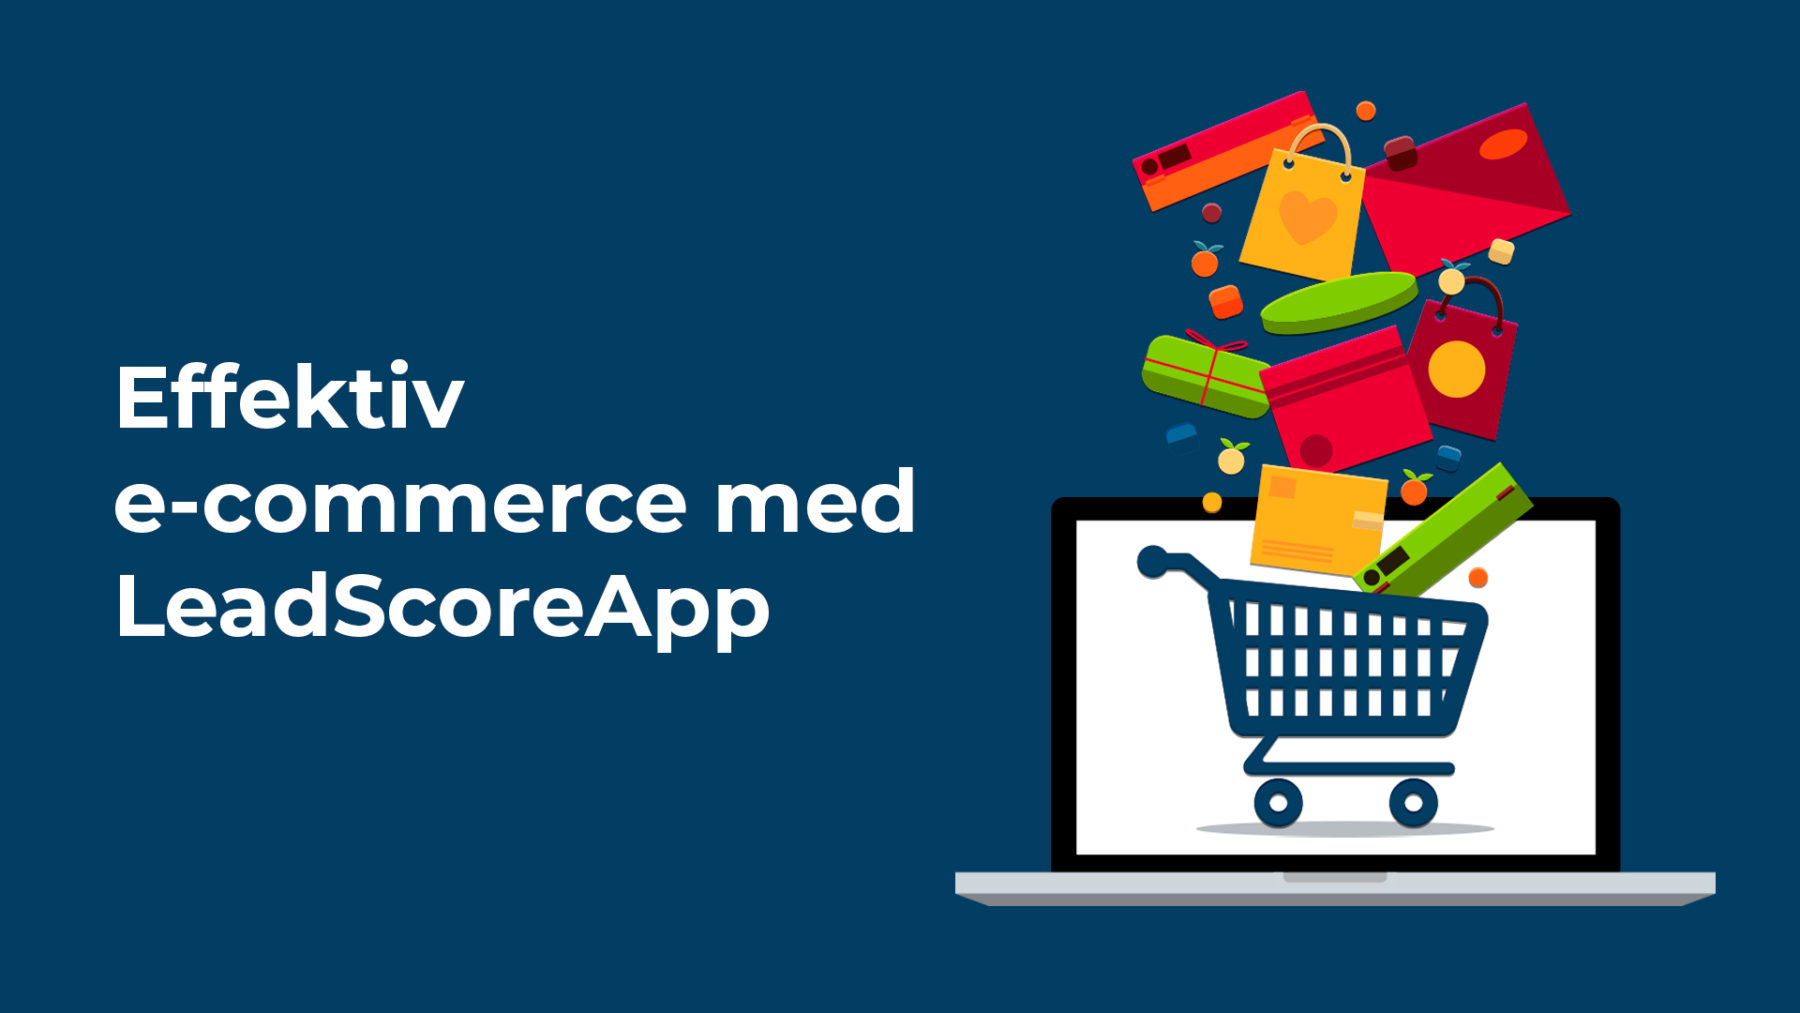 Effective e-commerce with LeadScoreApp